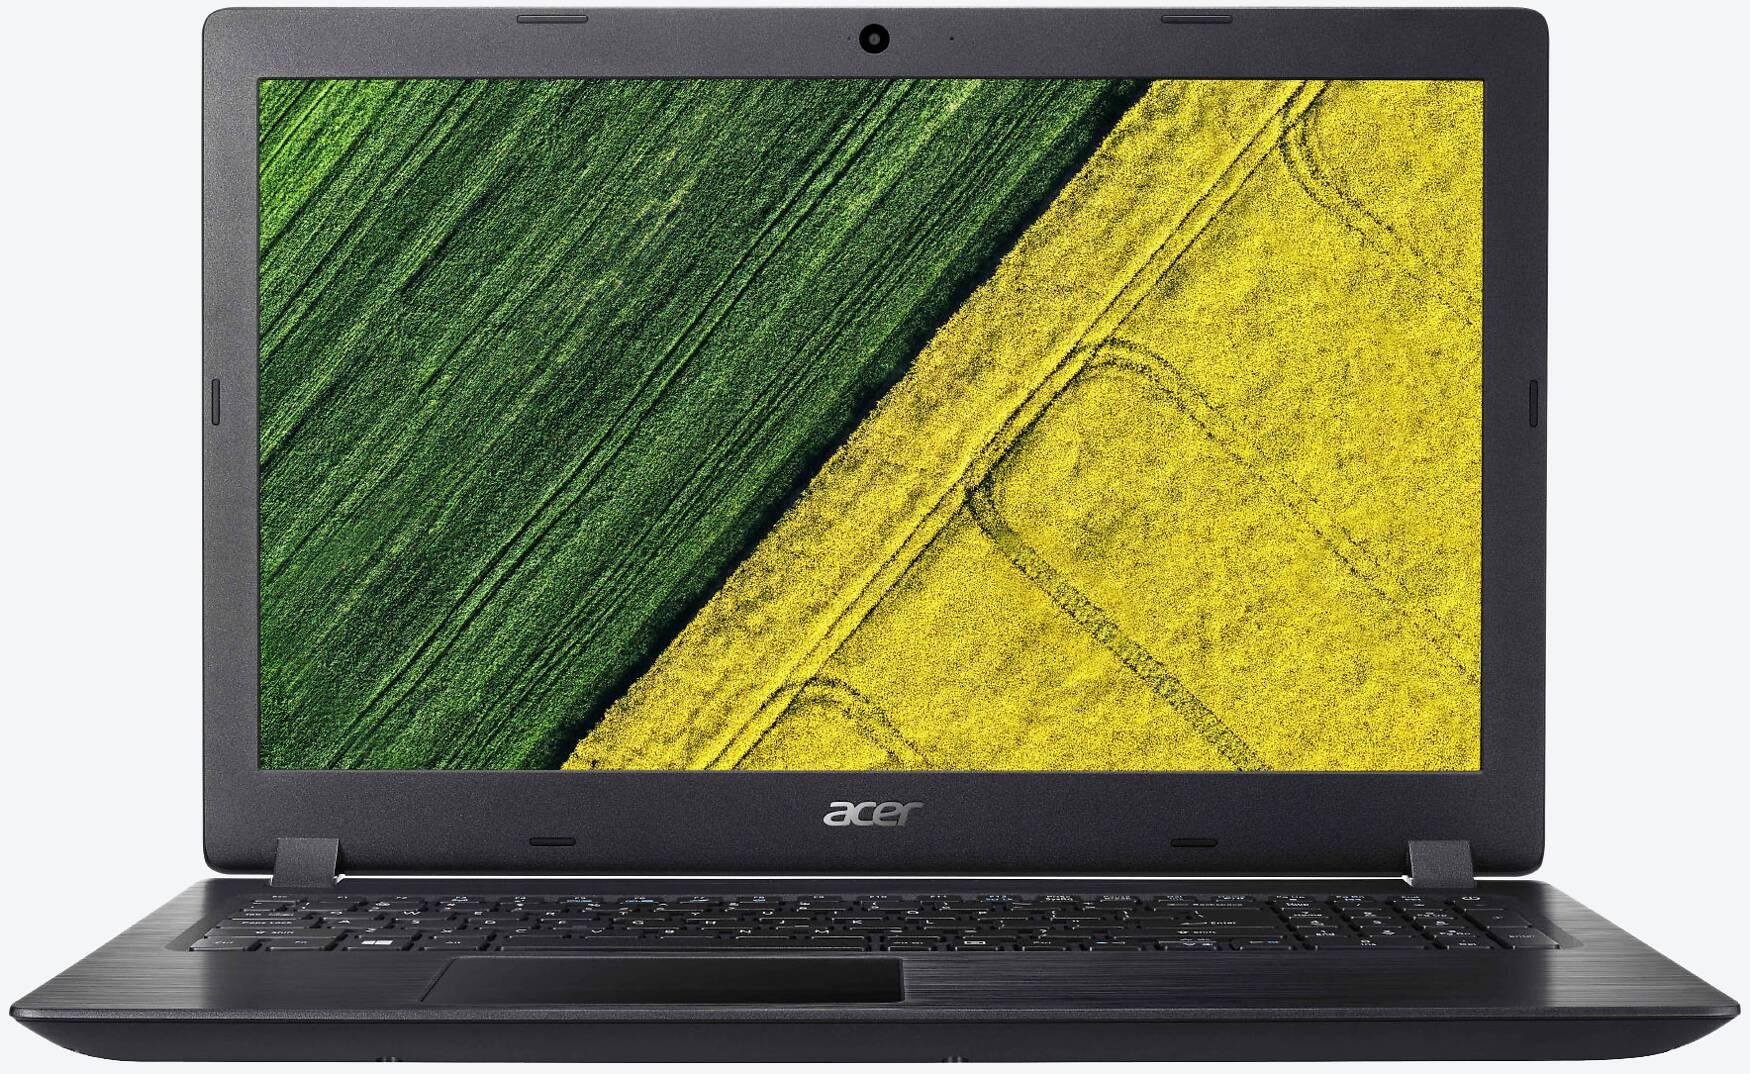 Acer Aspire 3 A315-53-54WA